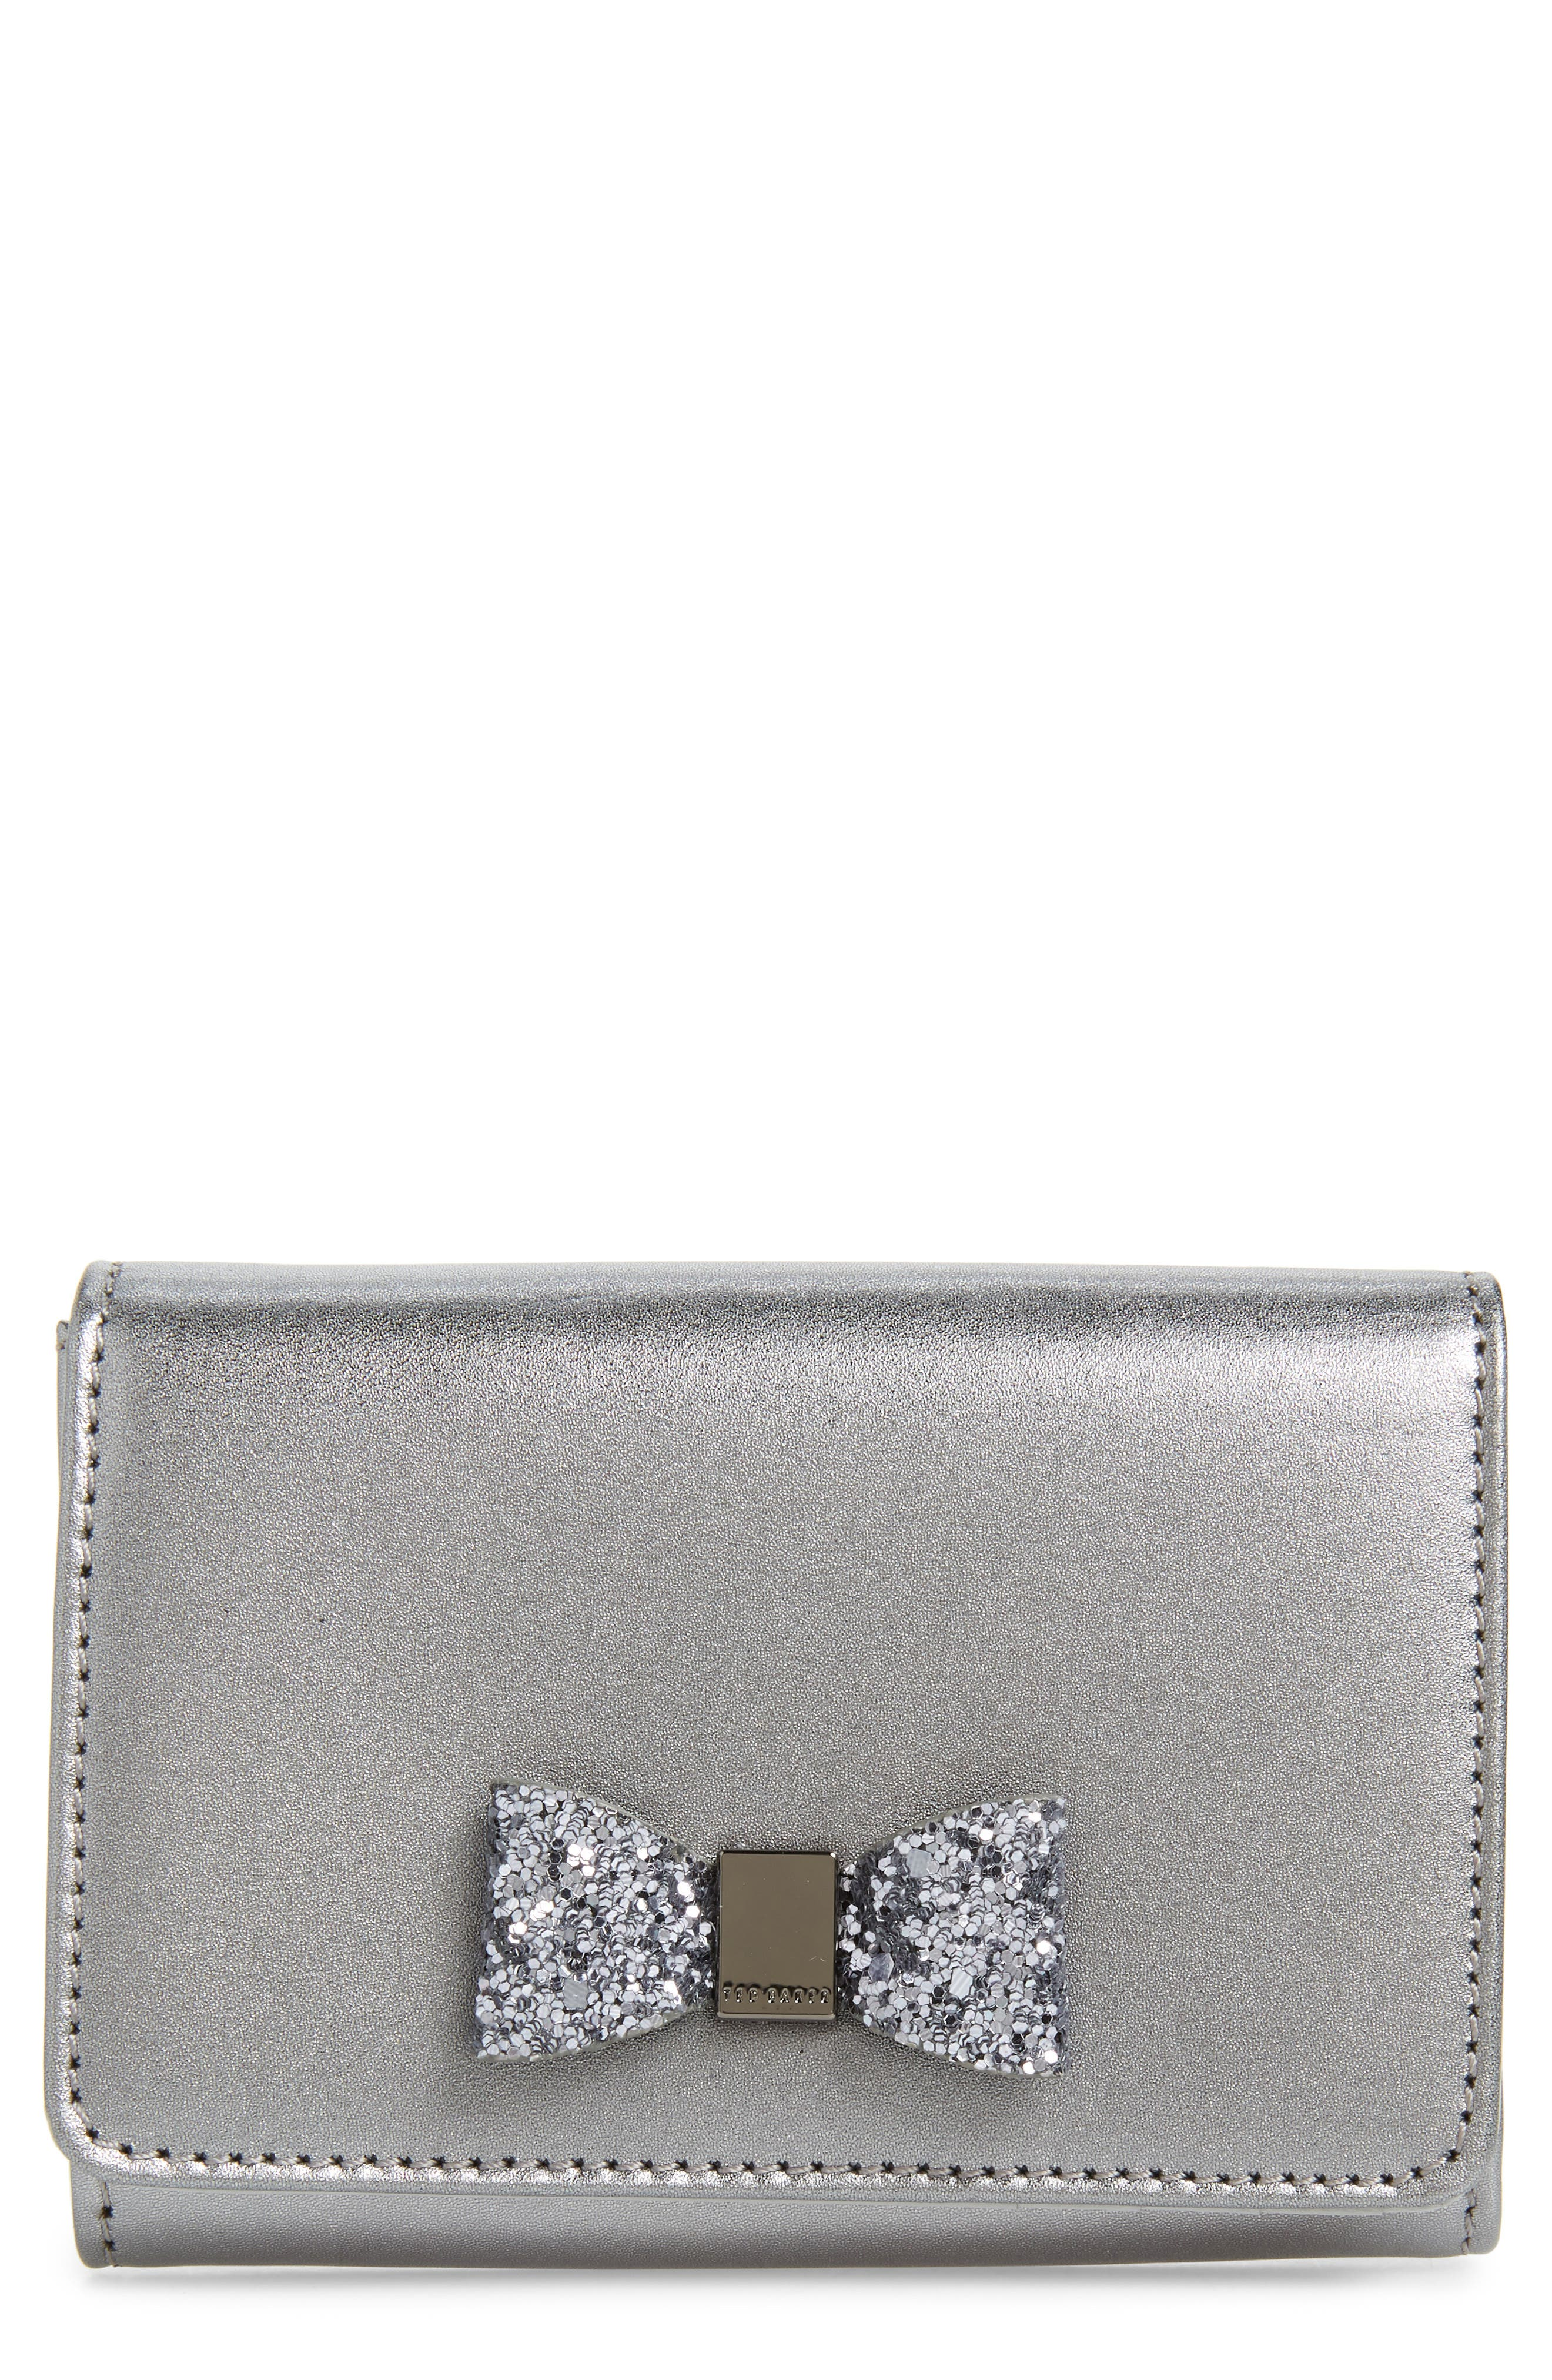 Mini Anki Bow Leather Wallet,                             Main thumbnail 1, color,                             GUNMETAL